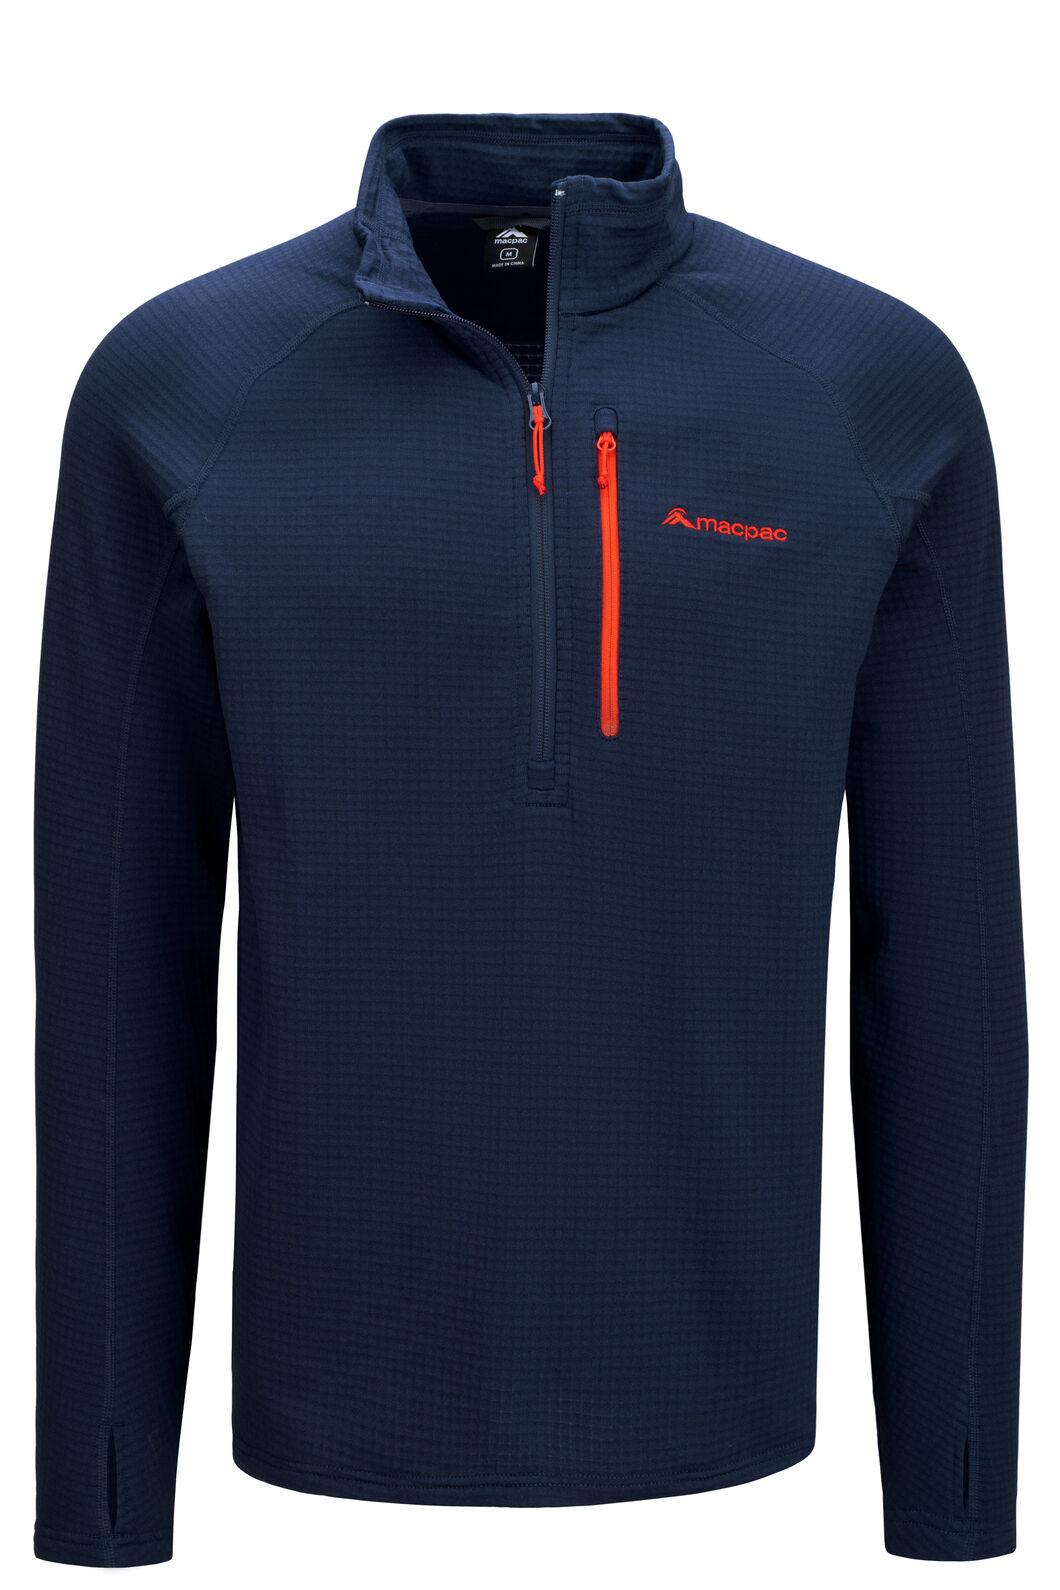 Macpac Ion Polartec® Fleece Half Zip Pullover — Men's, Black Iris/Grenadine, hi-res